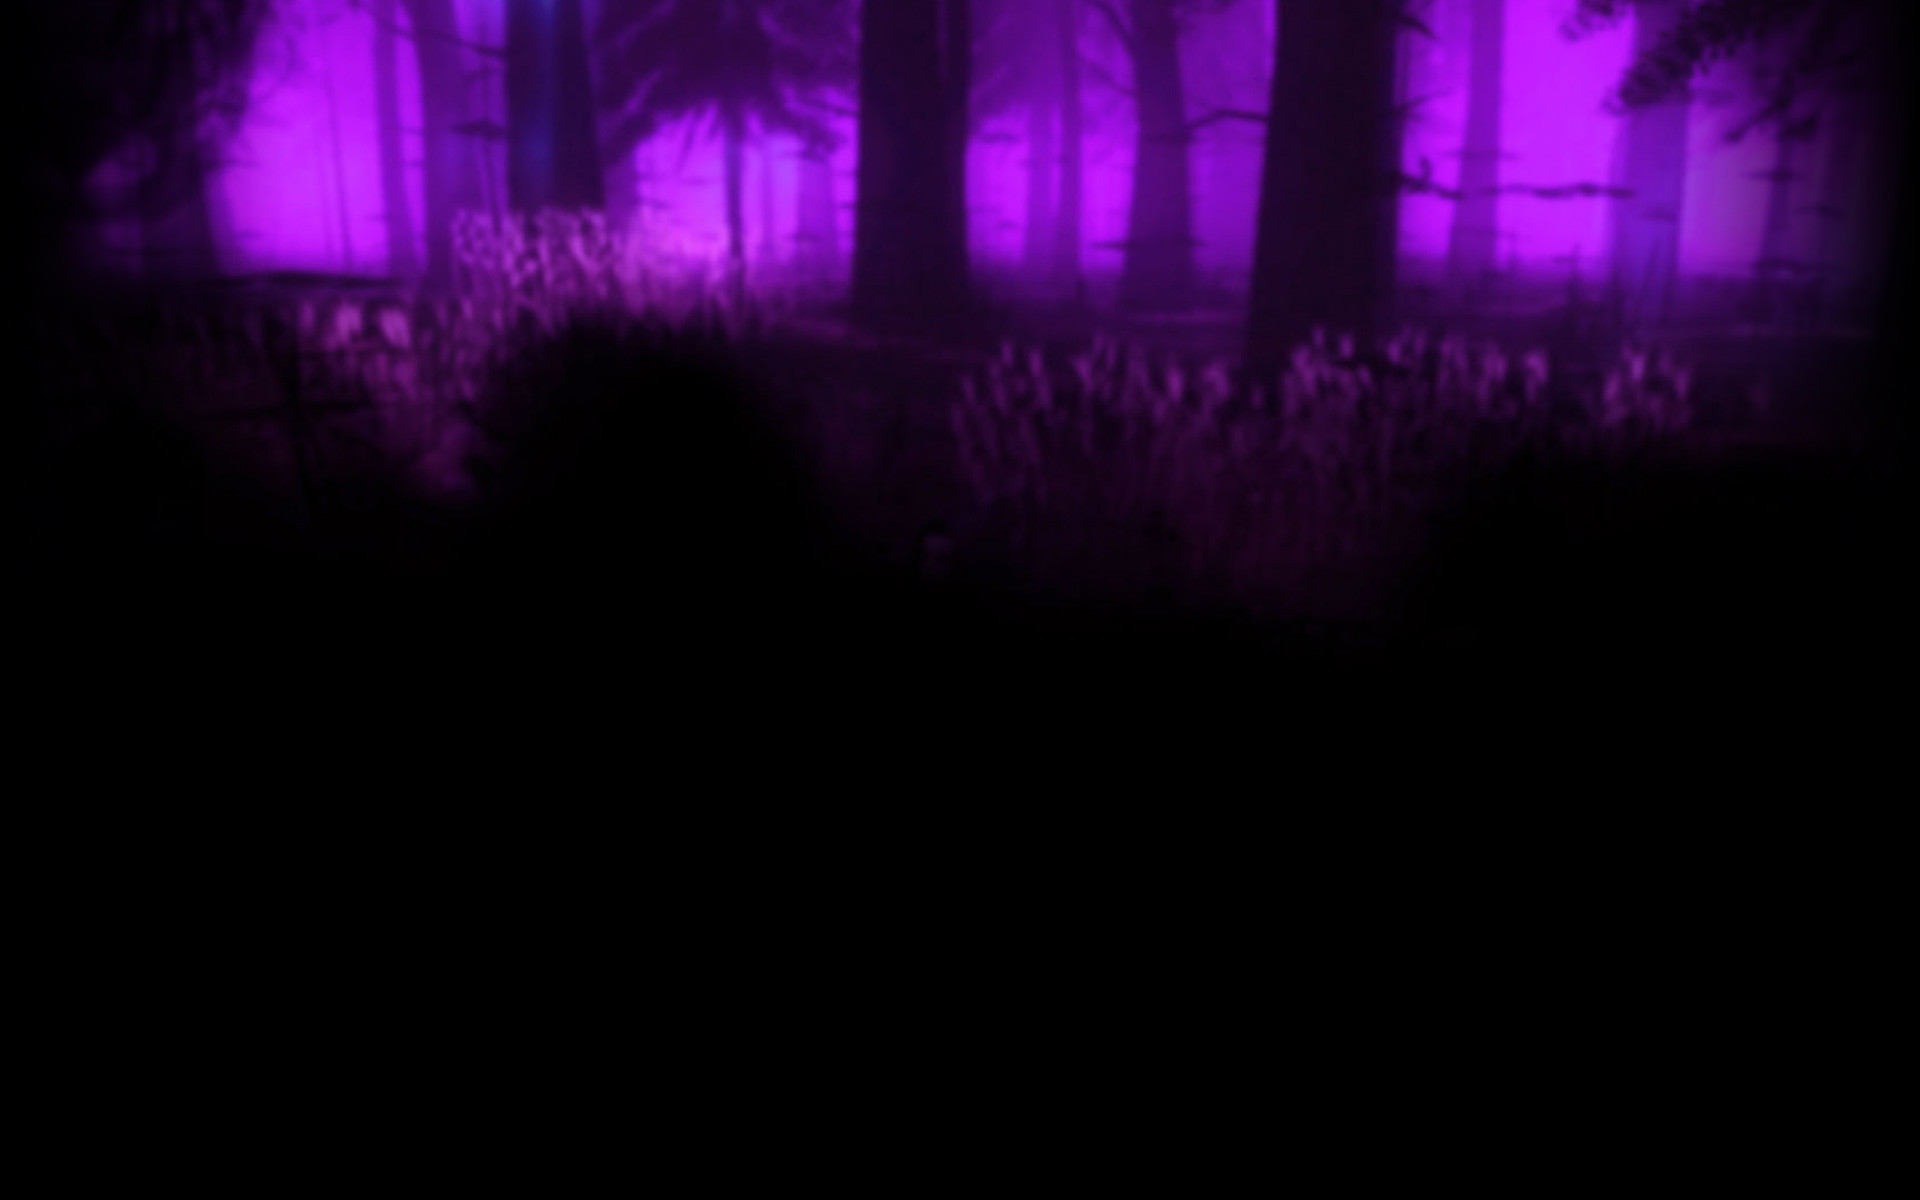 Xmas Wallpaper Iphone Cute Purple Background 183 ① Wallpapertag